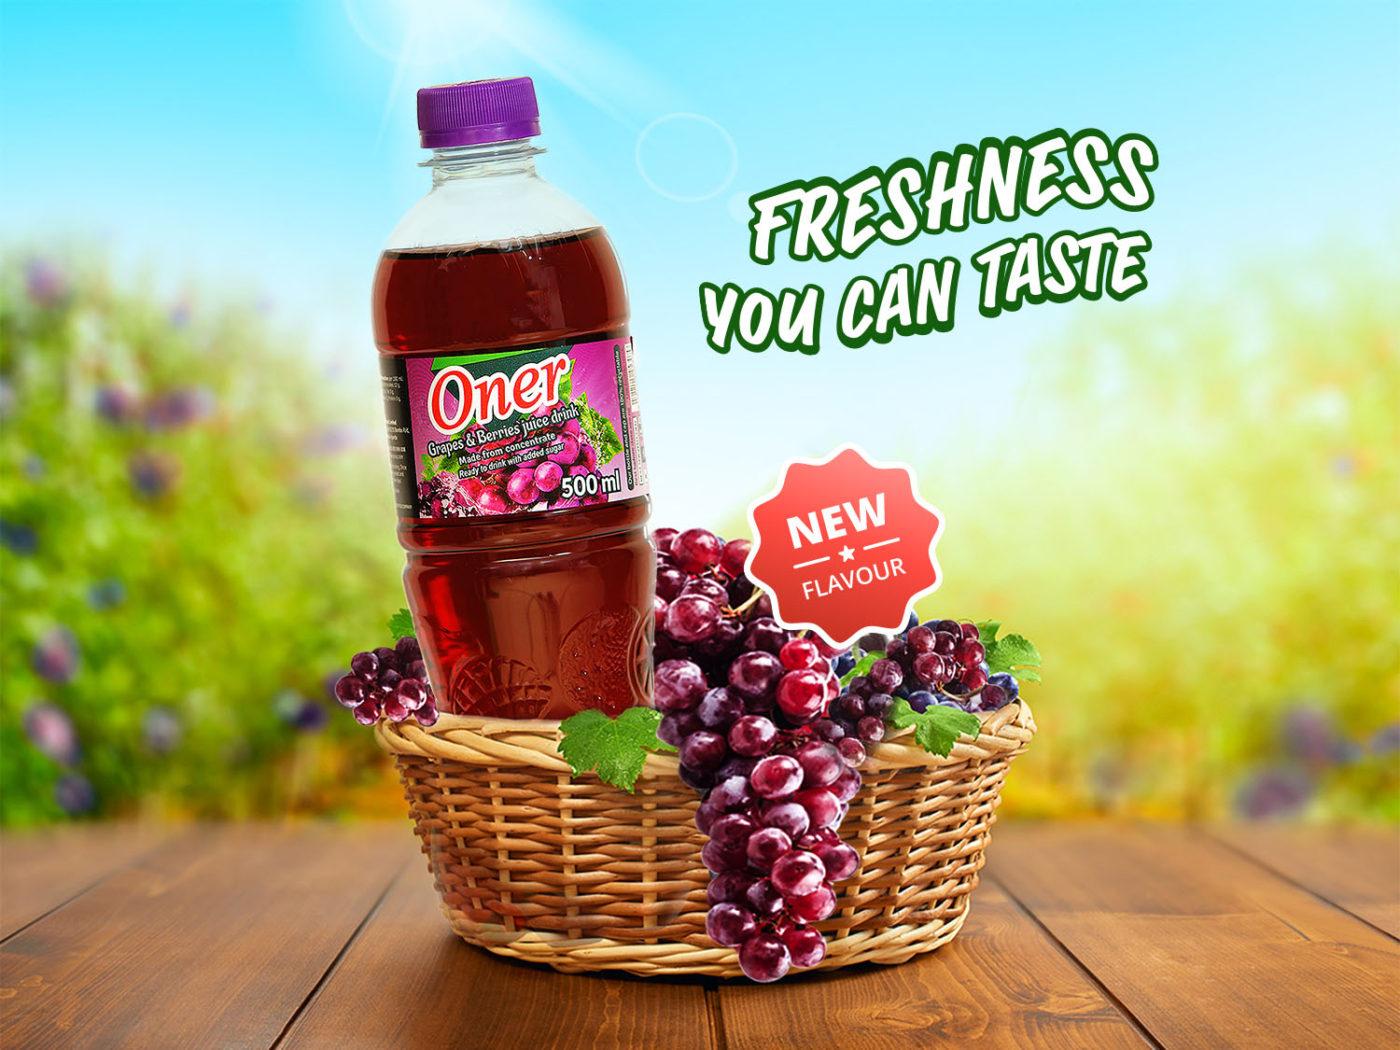 RIHAM announces new Oner Fruit Juice Flavour 1 MUGIBSON WRITES